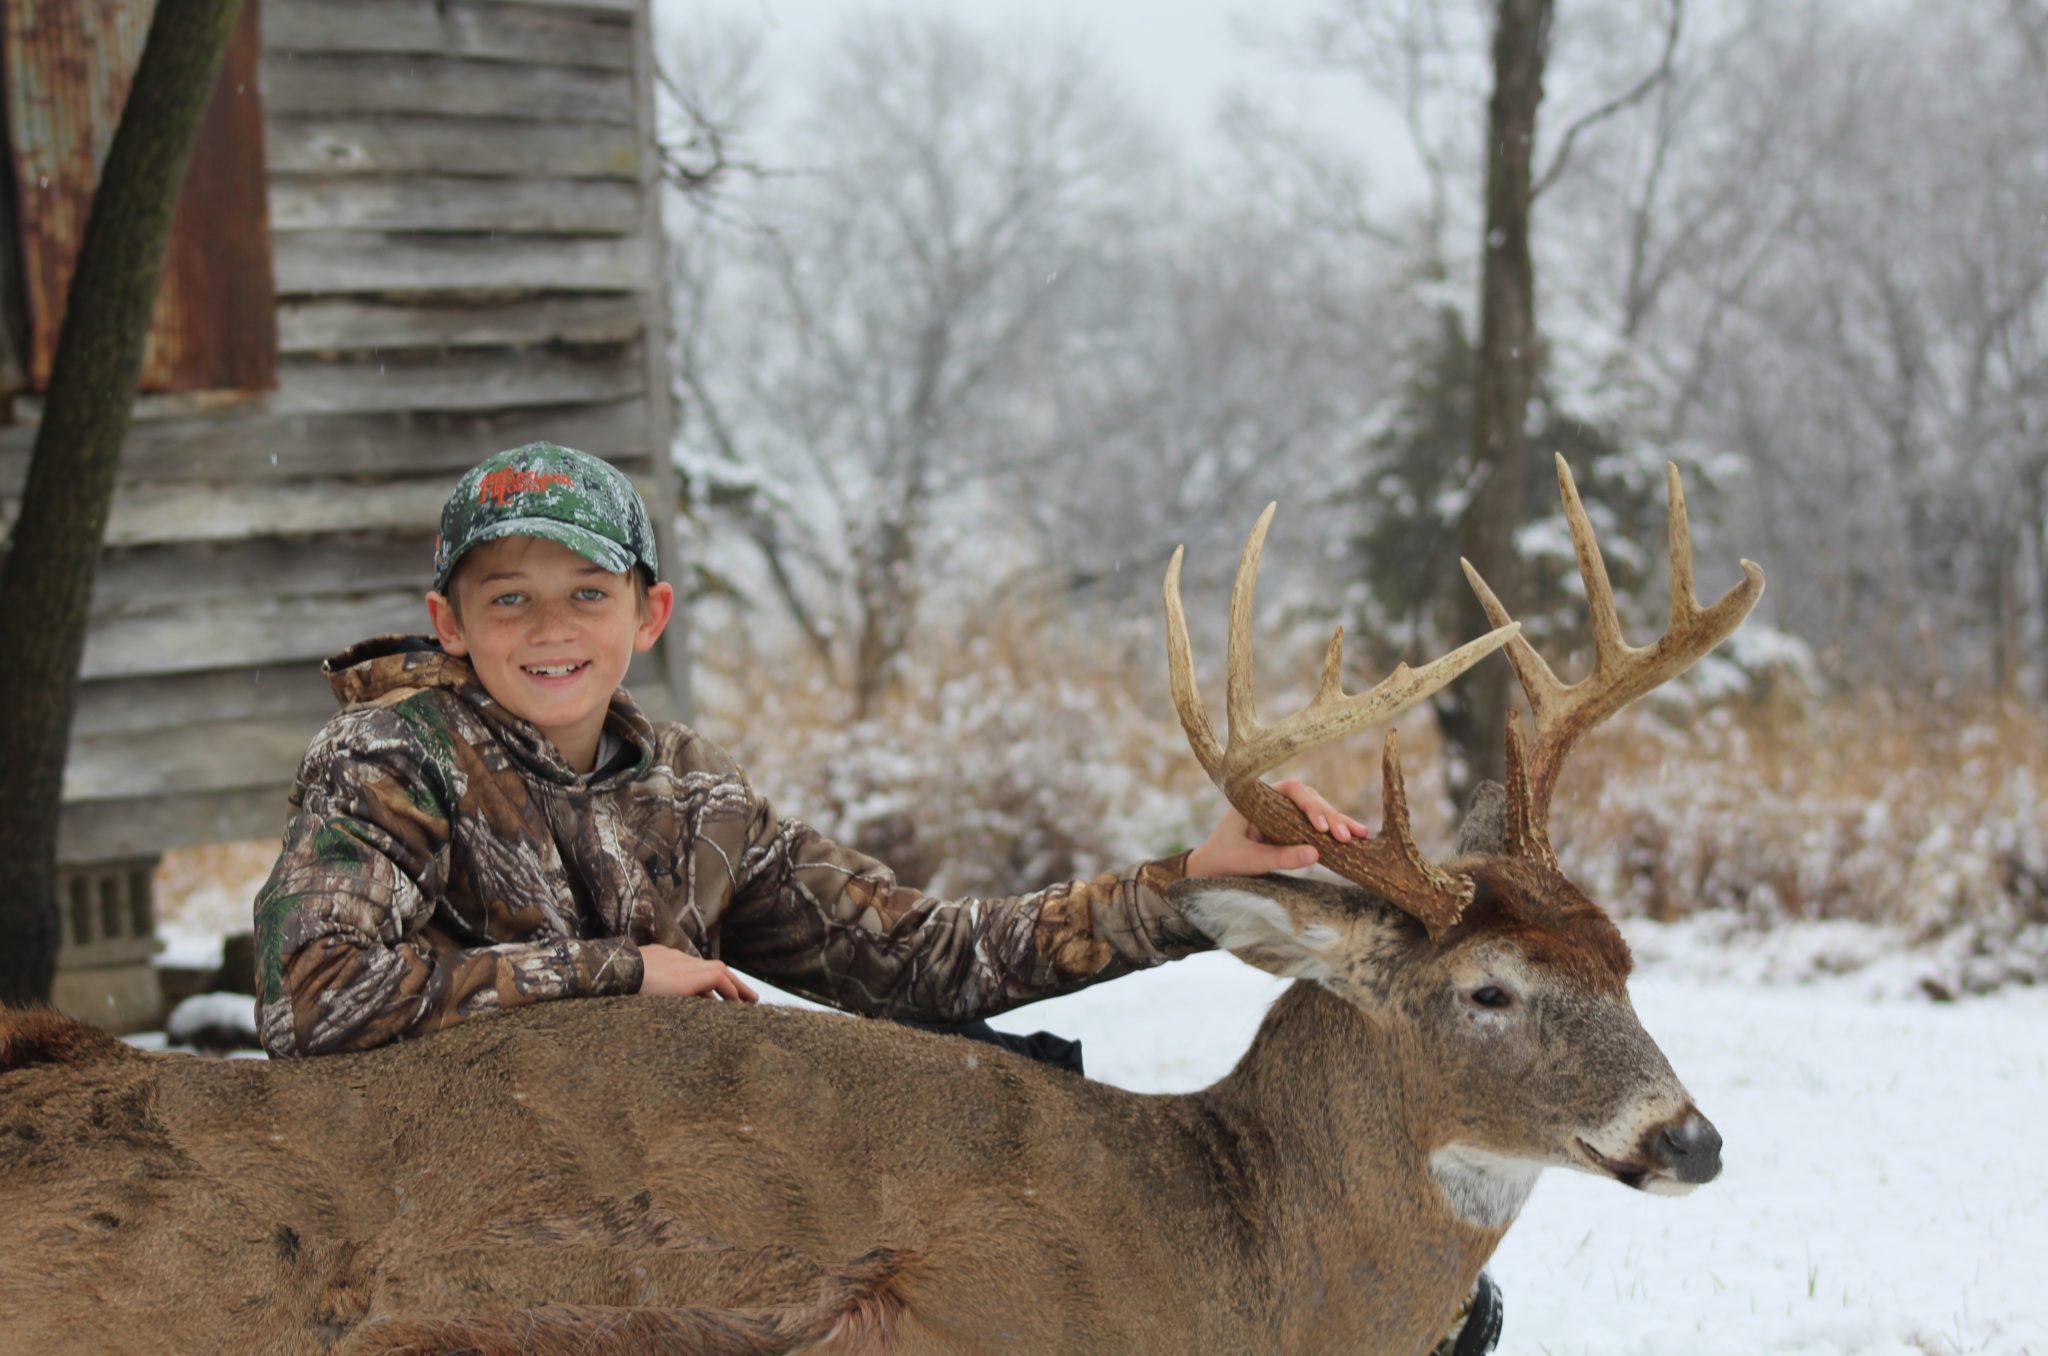 Late Season Whitetail Hunting: Illinois Late Deer Hunts throughout Rut Whitetail 2021